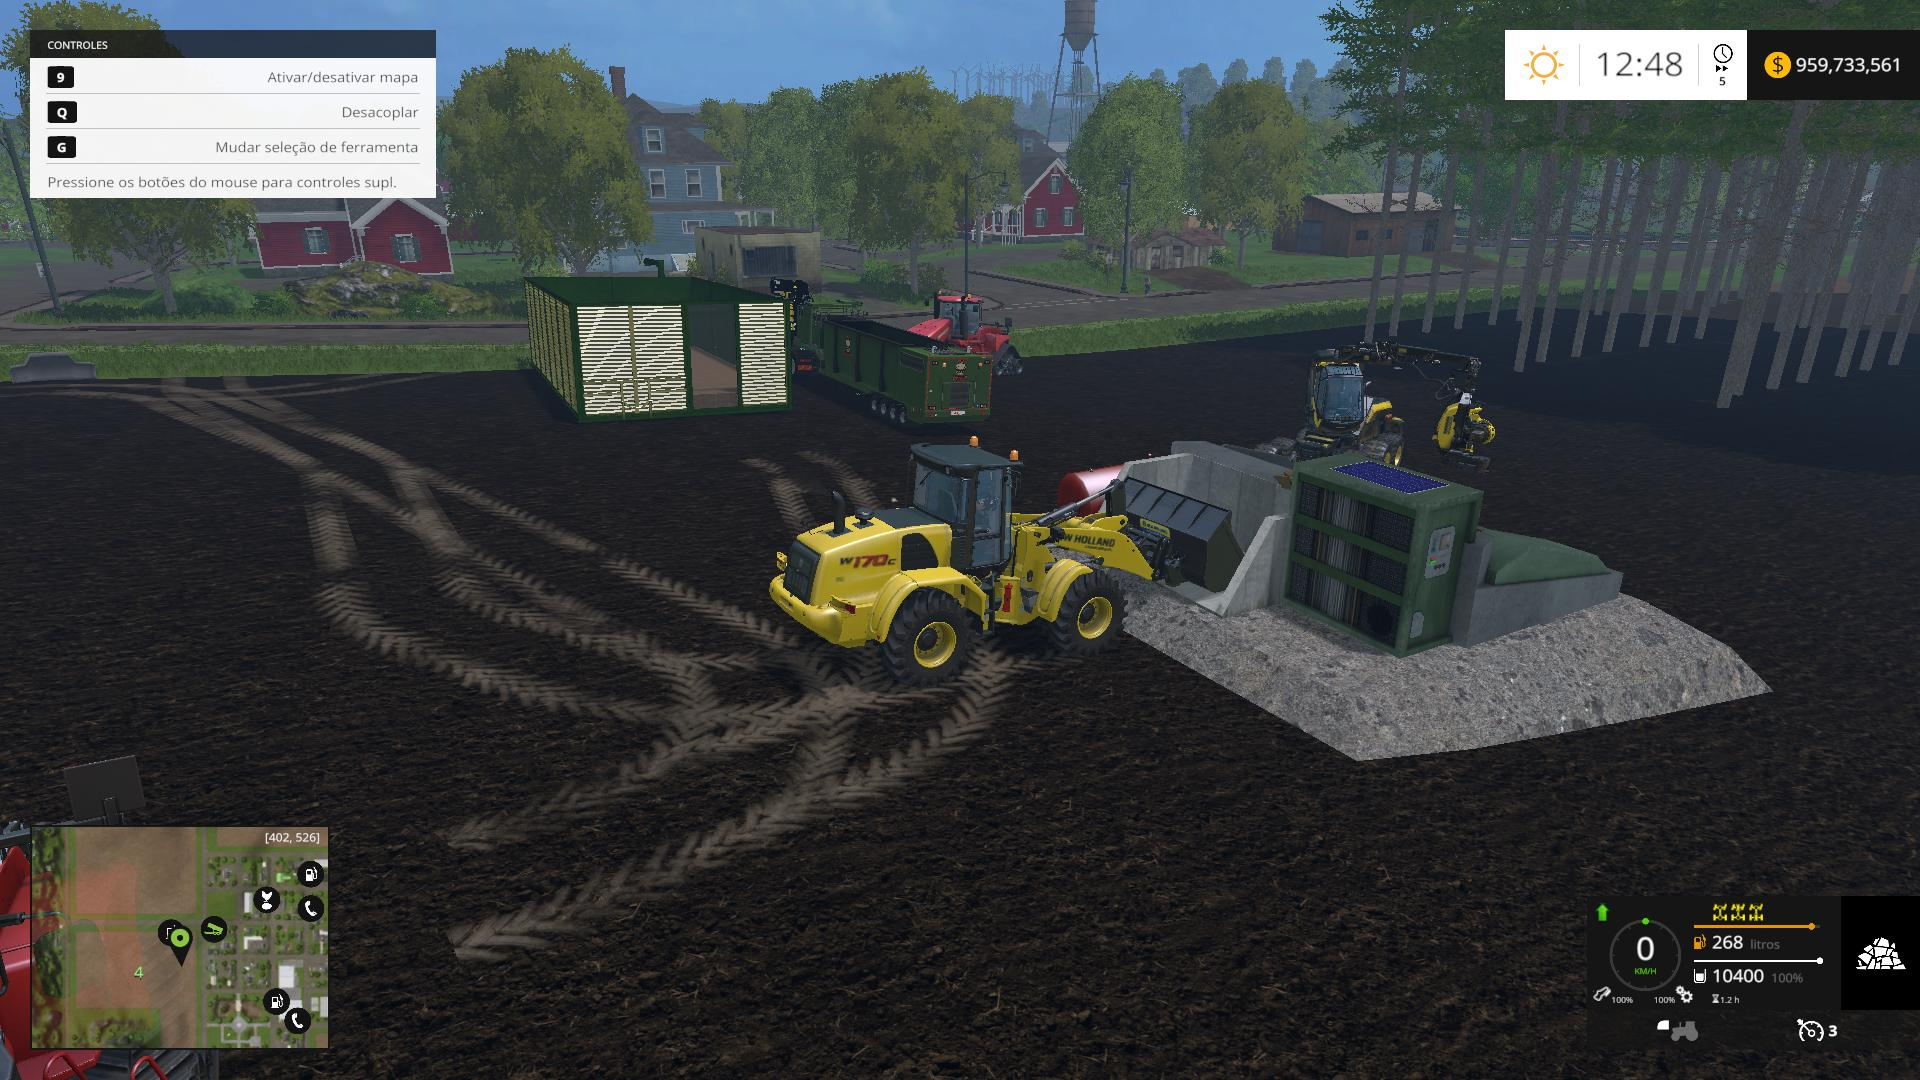 new-holland-shovel-10-000-liters-fs-2015_2